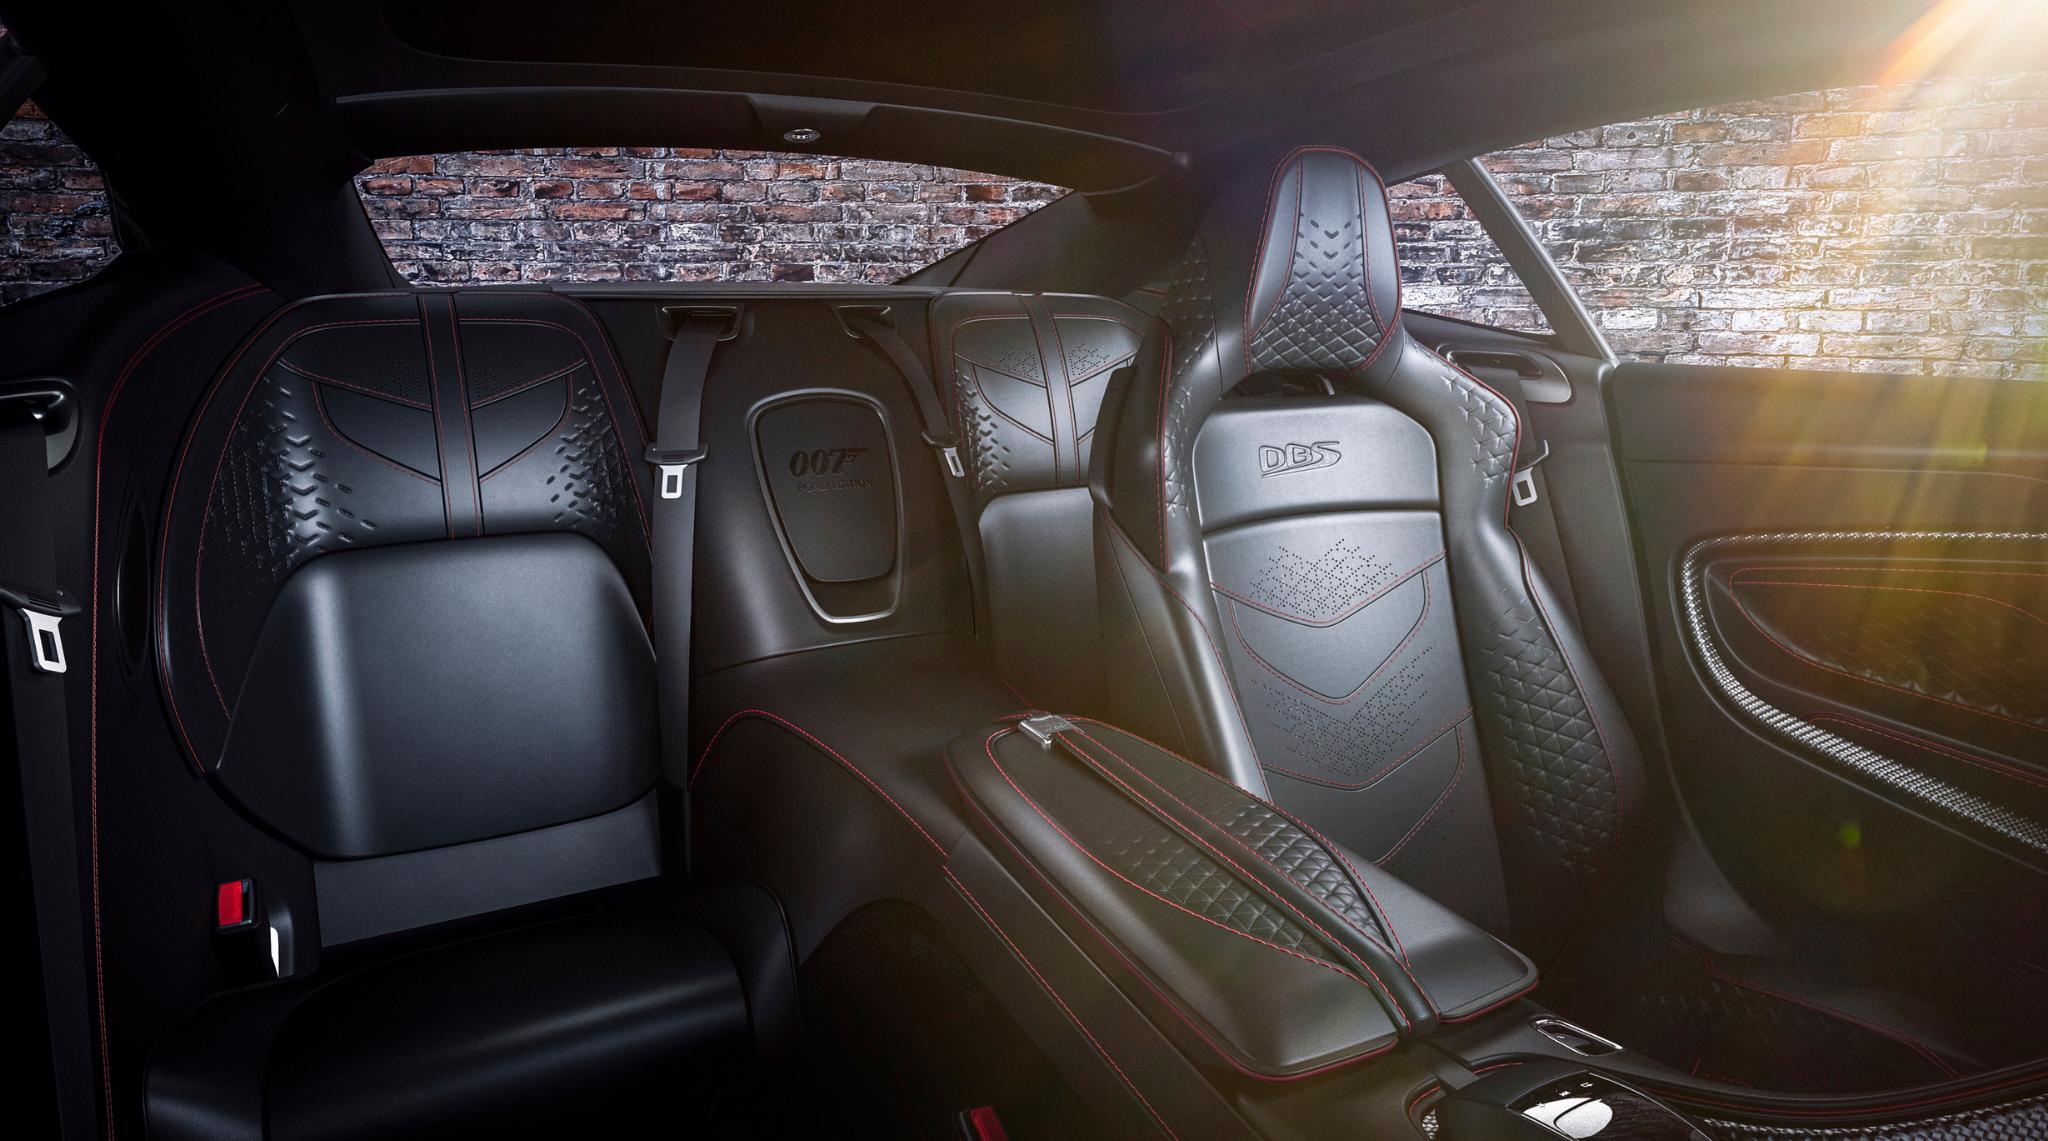 007 Aston Martin DBS Superleggera Interior.2